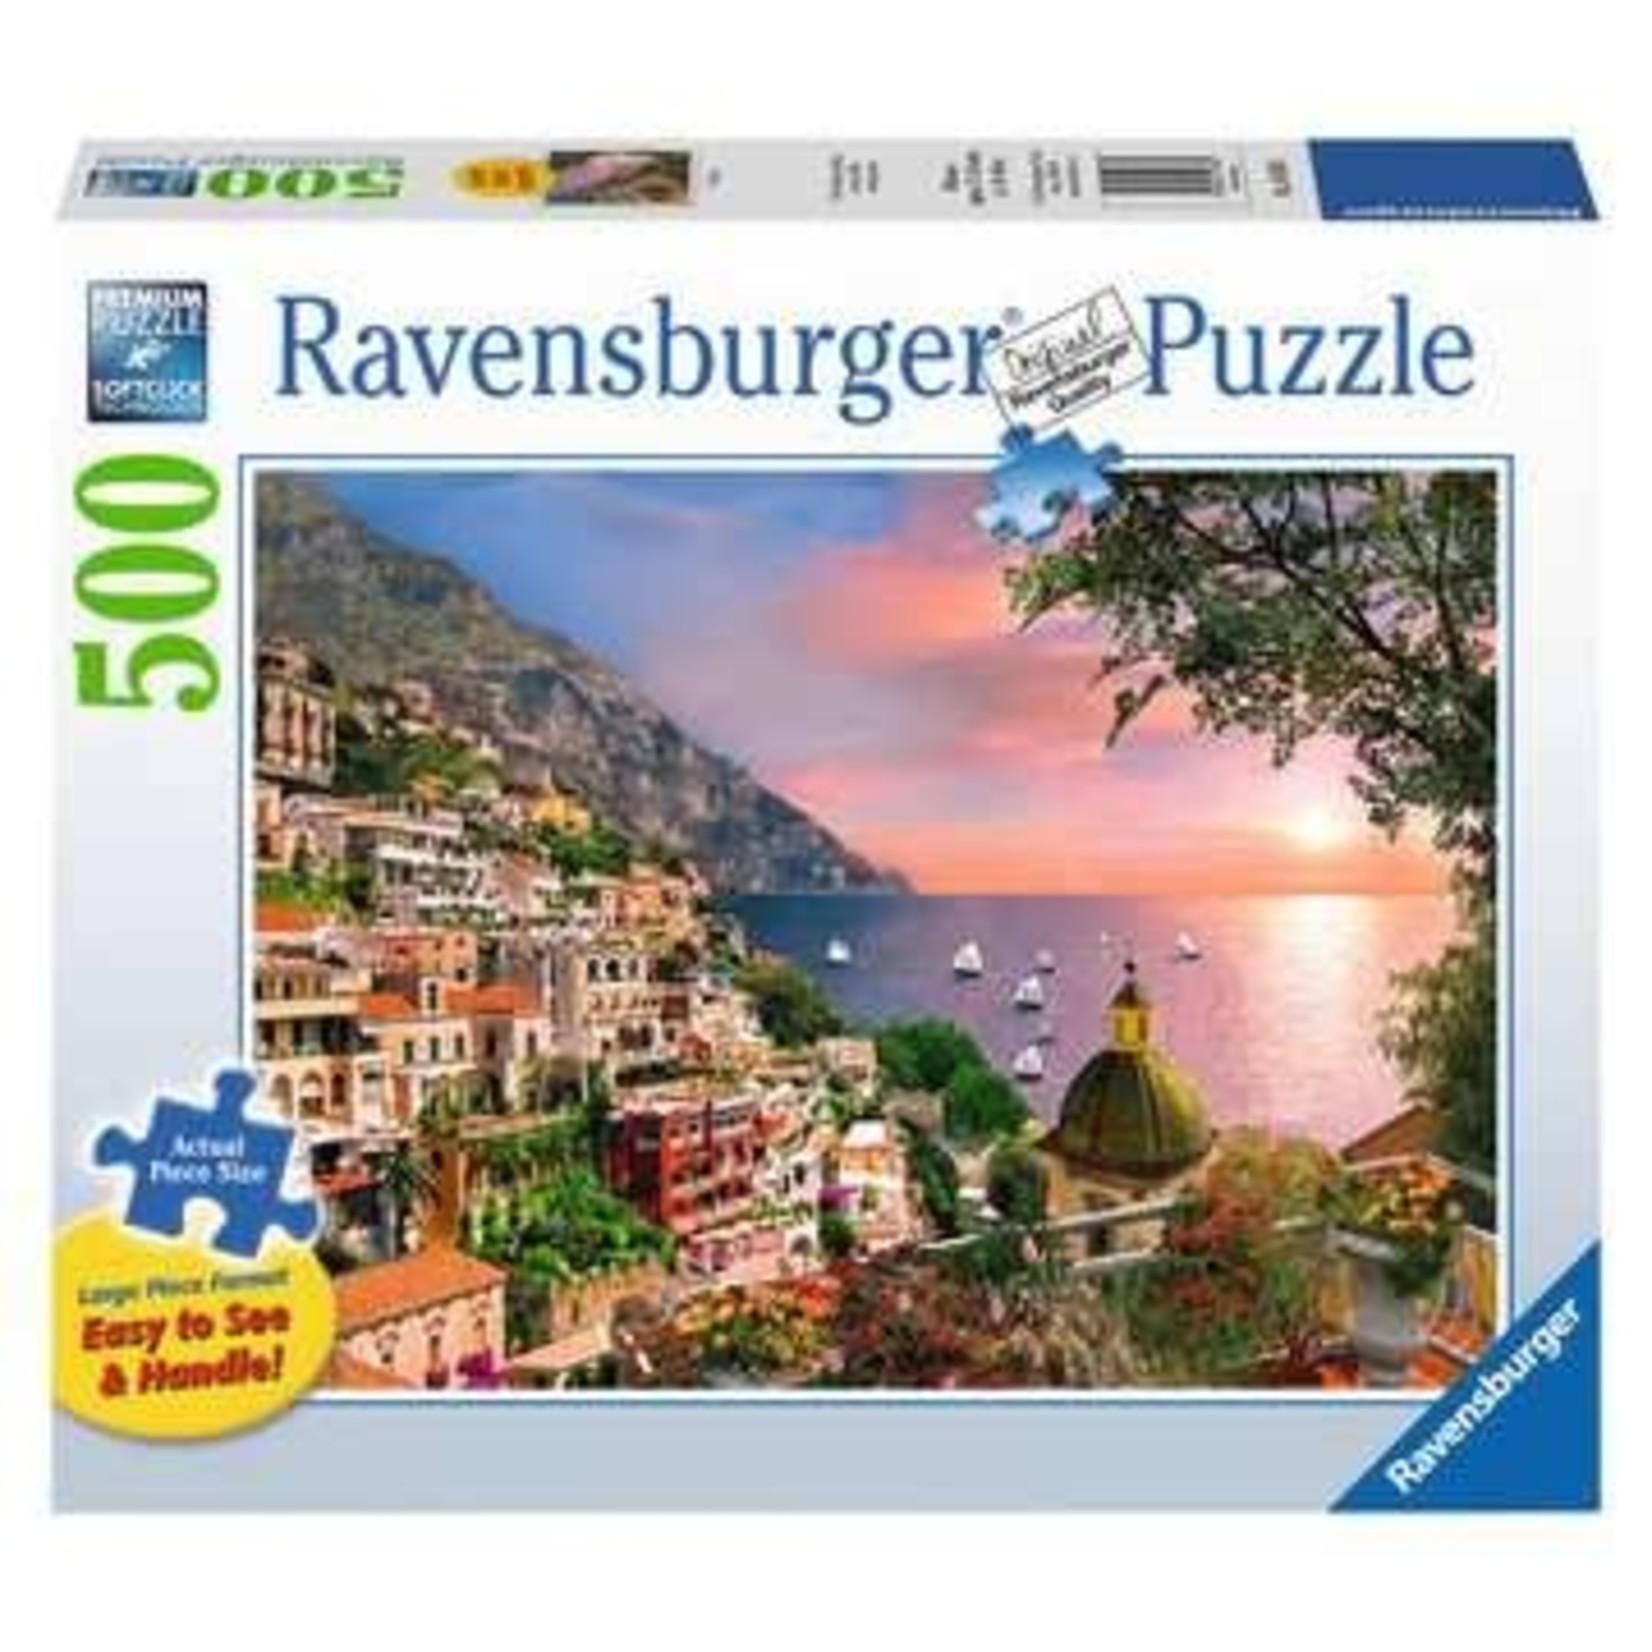 Ravensburger Positano 500 - Piece Jigsaw Puzzle